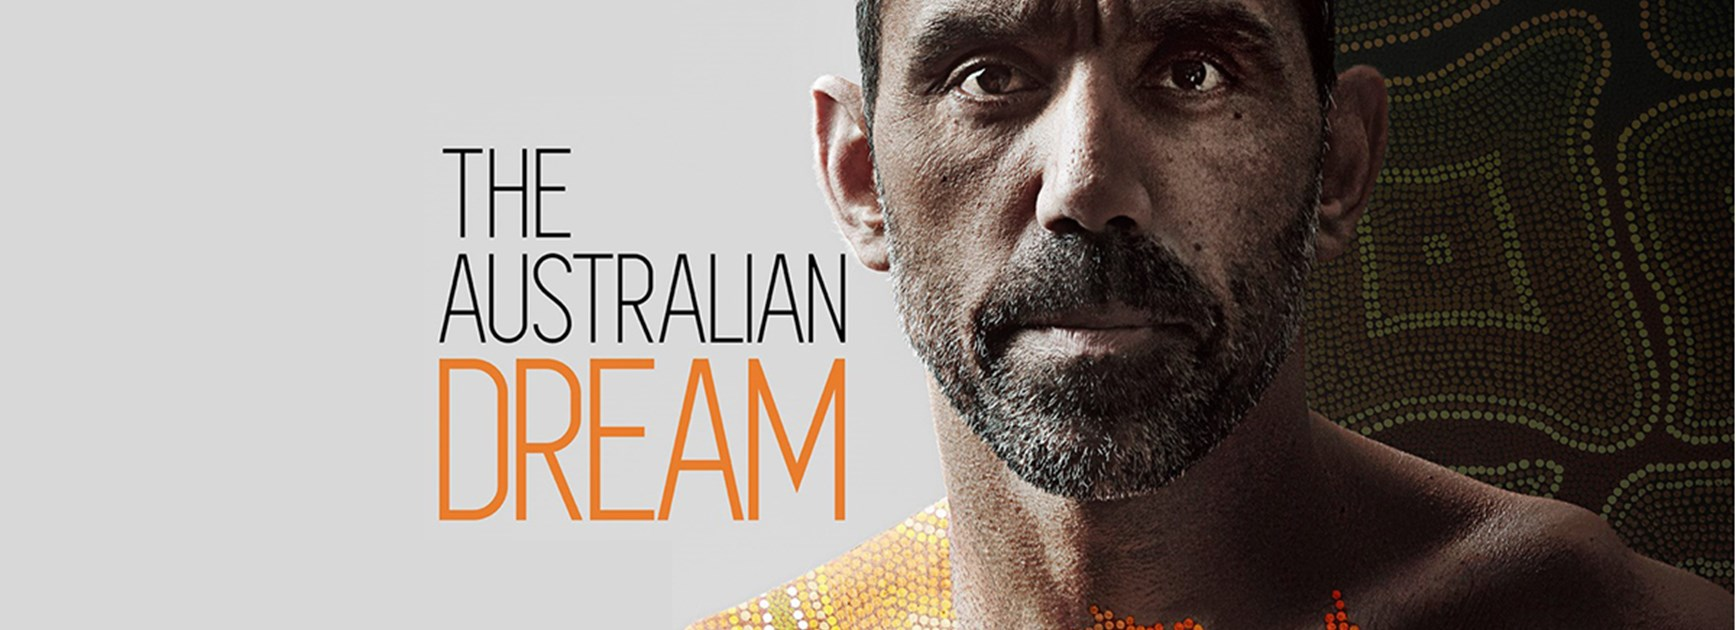 the australian dream - photo #4